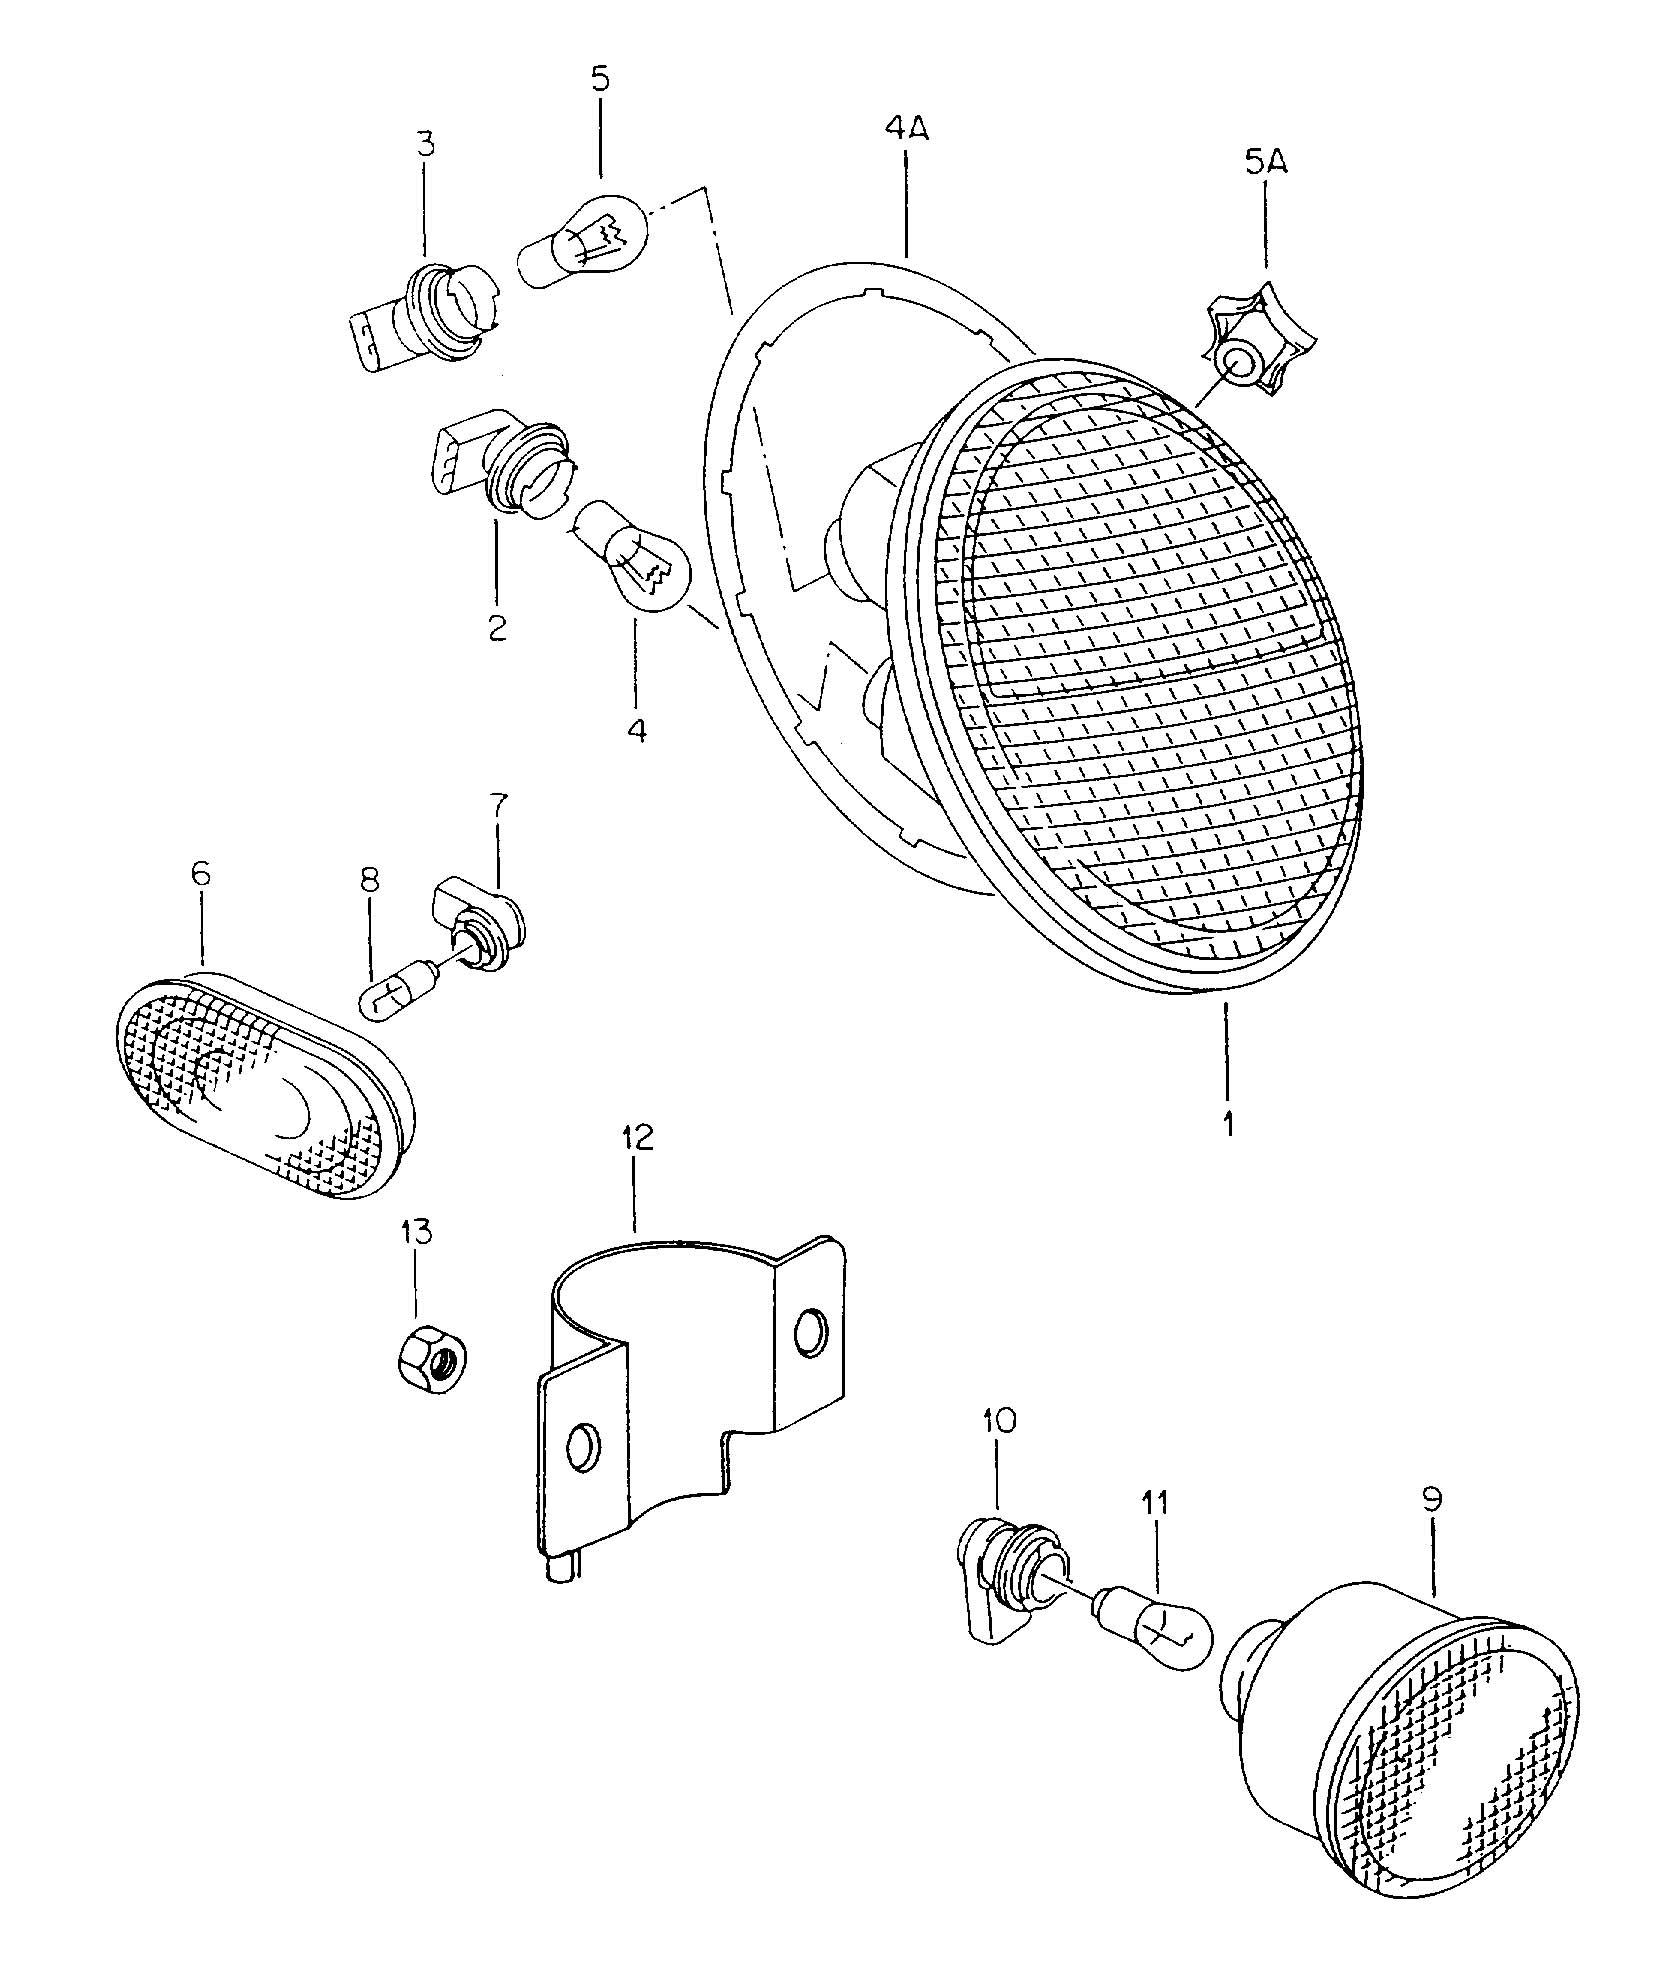 Volkswagen Bulb Socket To Be Used For Socket For